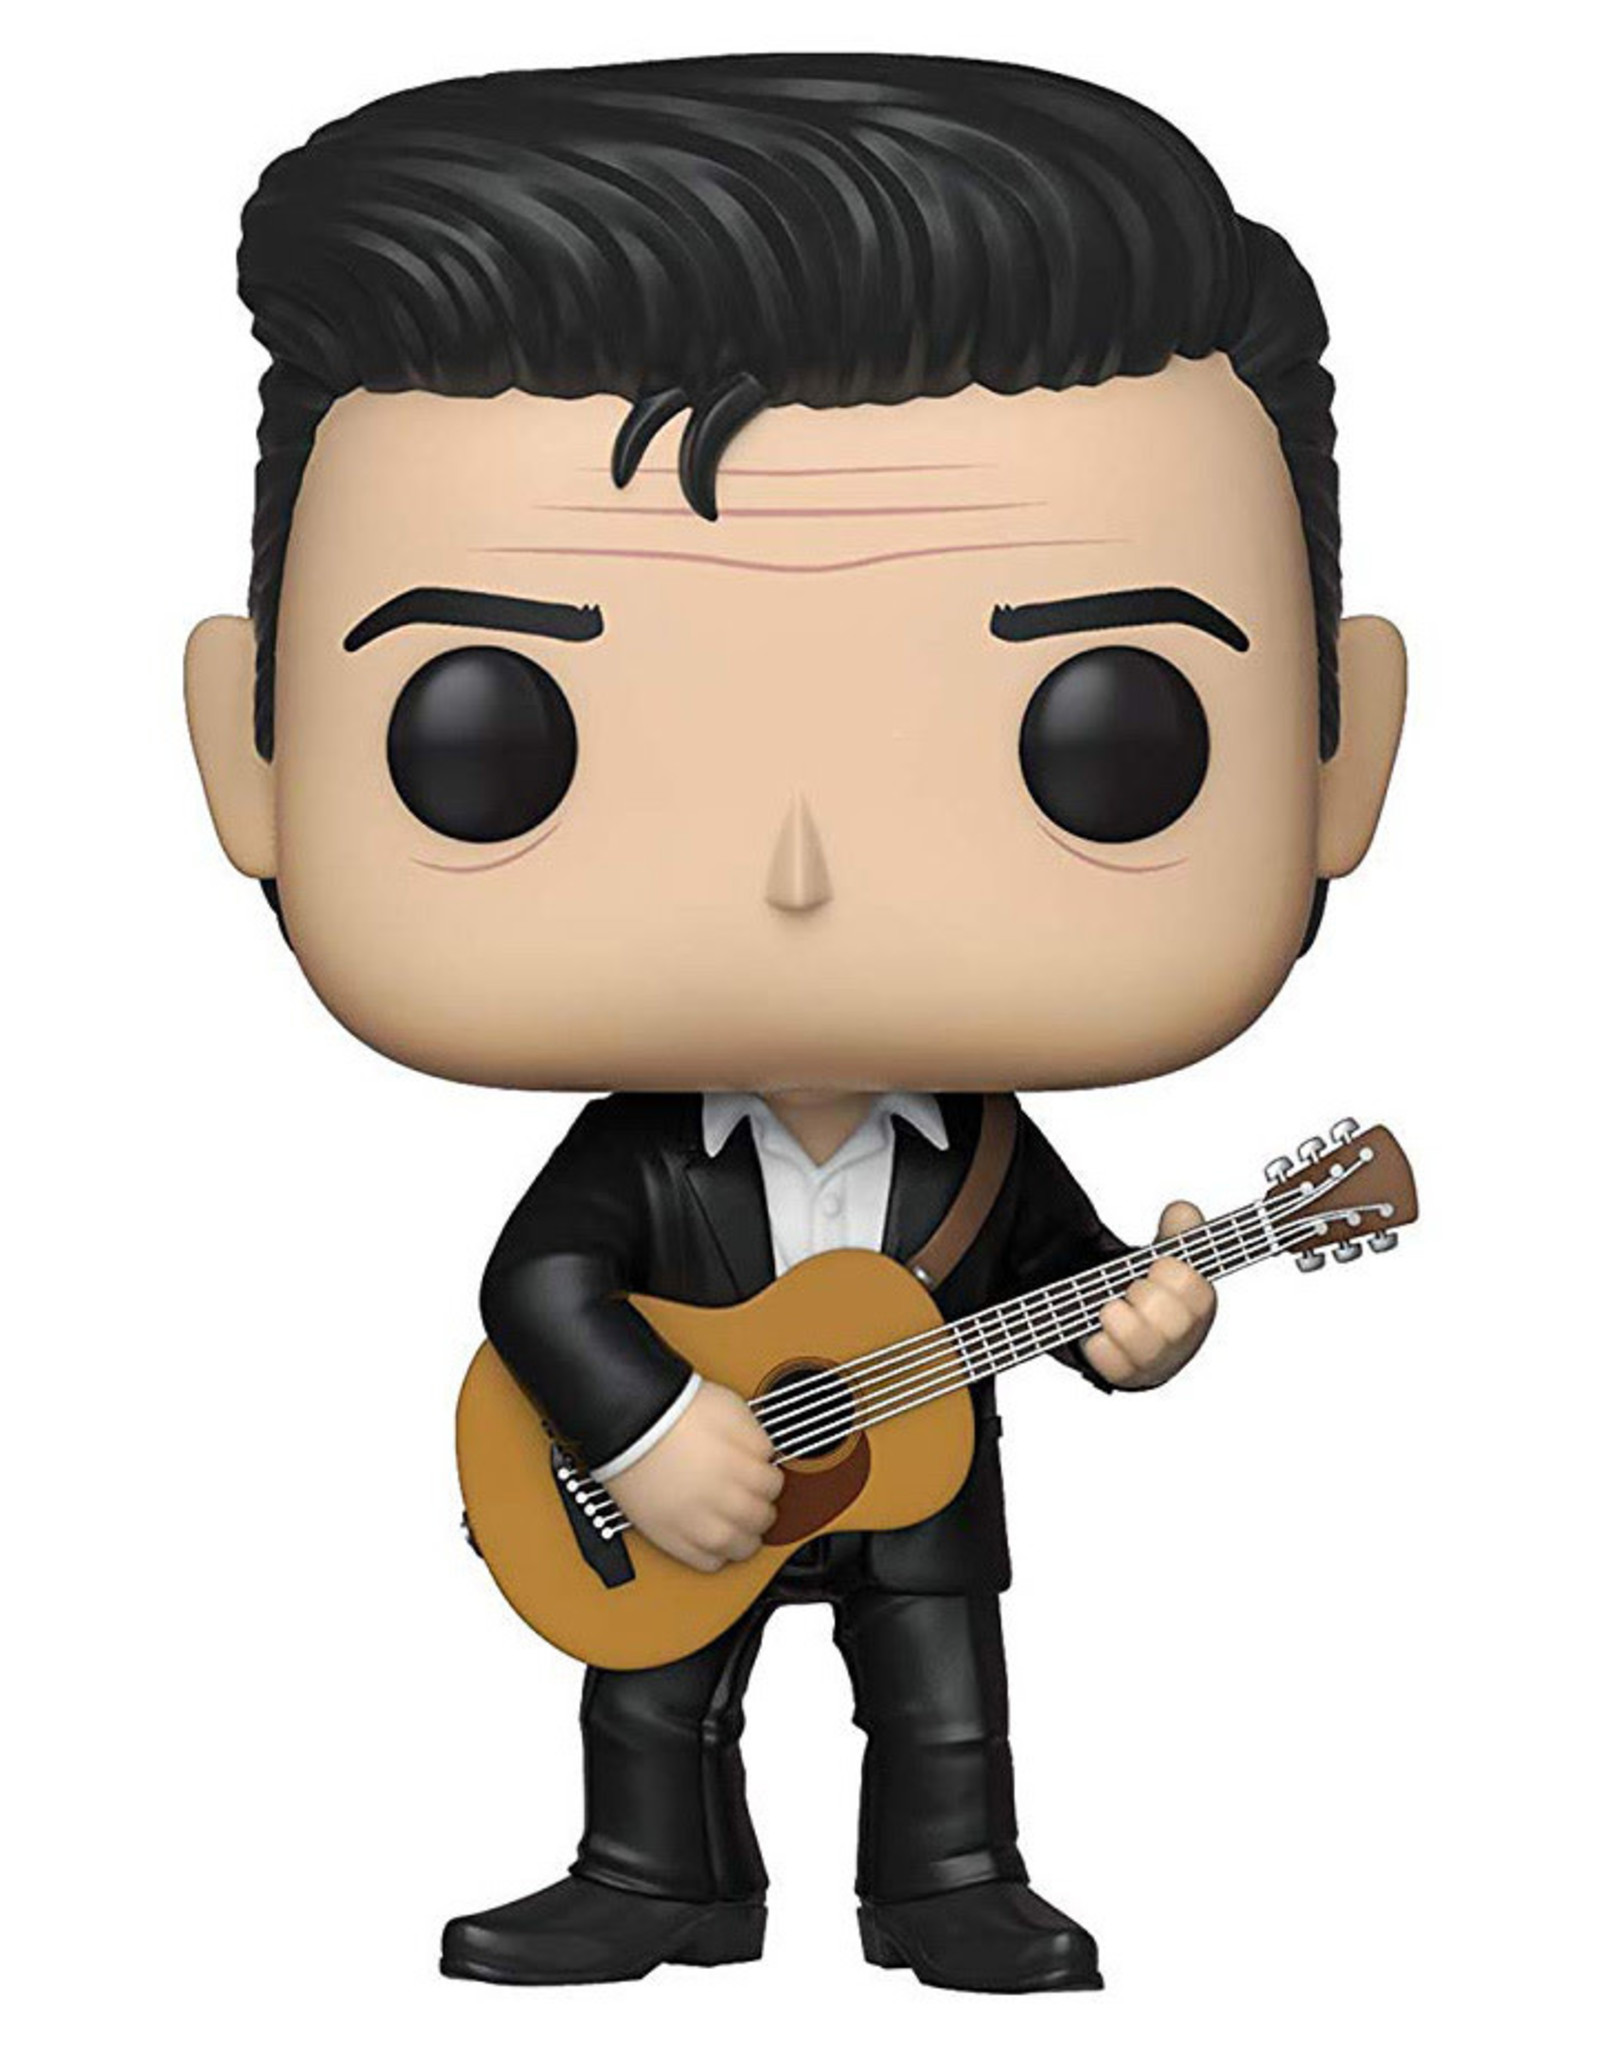 Funko Pop! Funko Pop! Rocks nr117 Johnny Cash - Folsom Prison